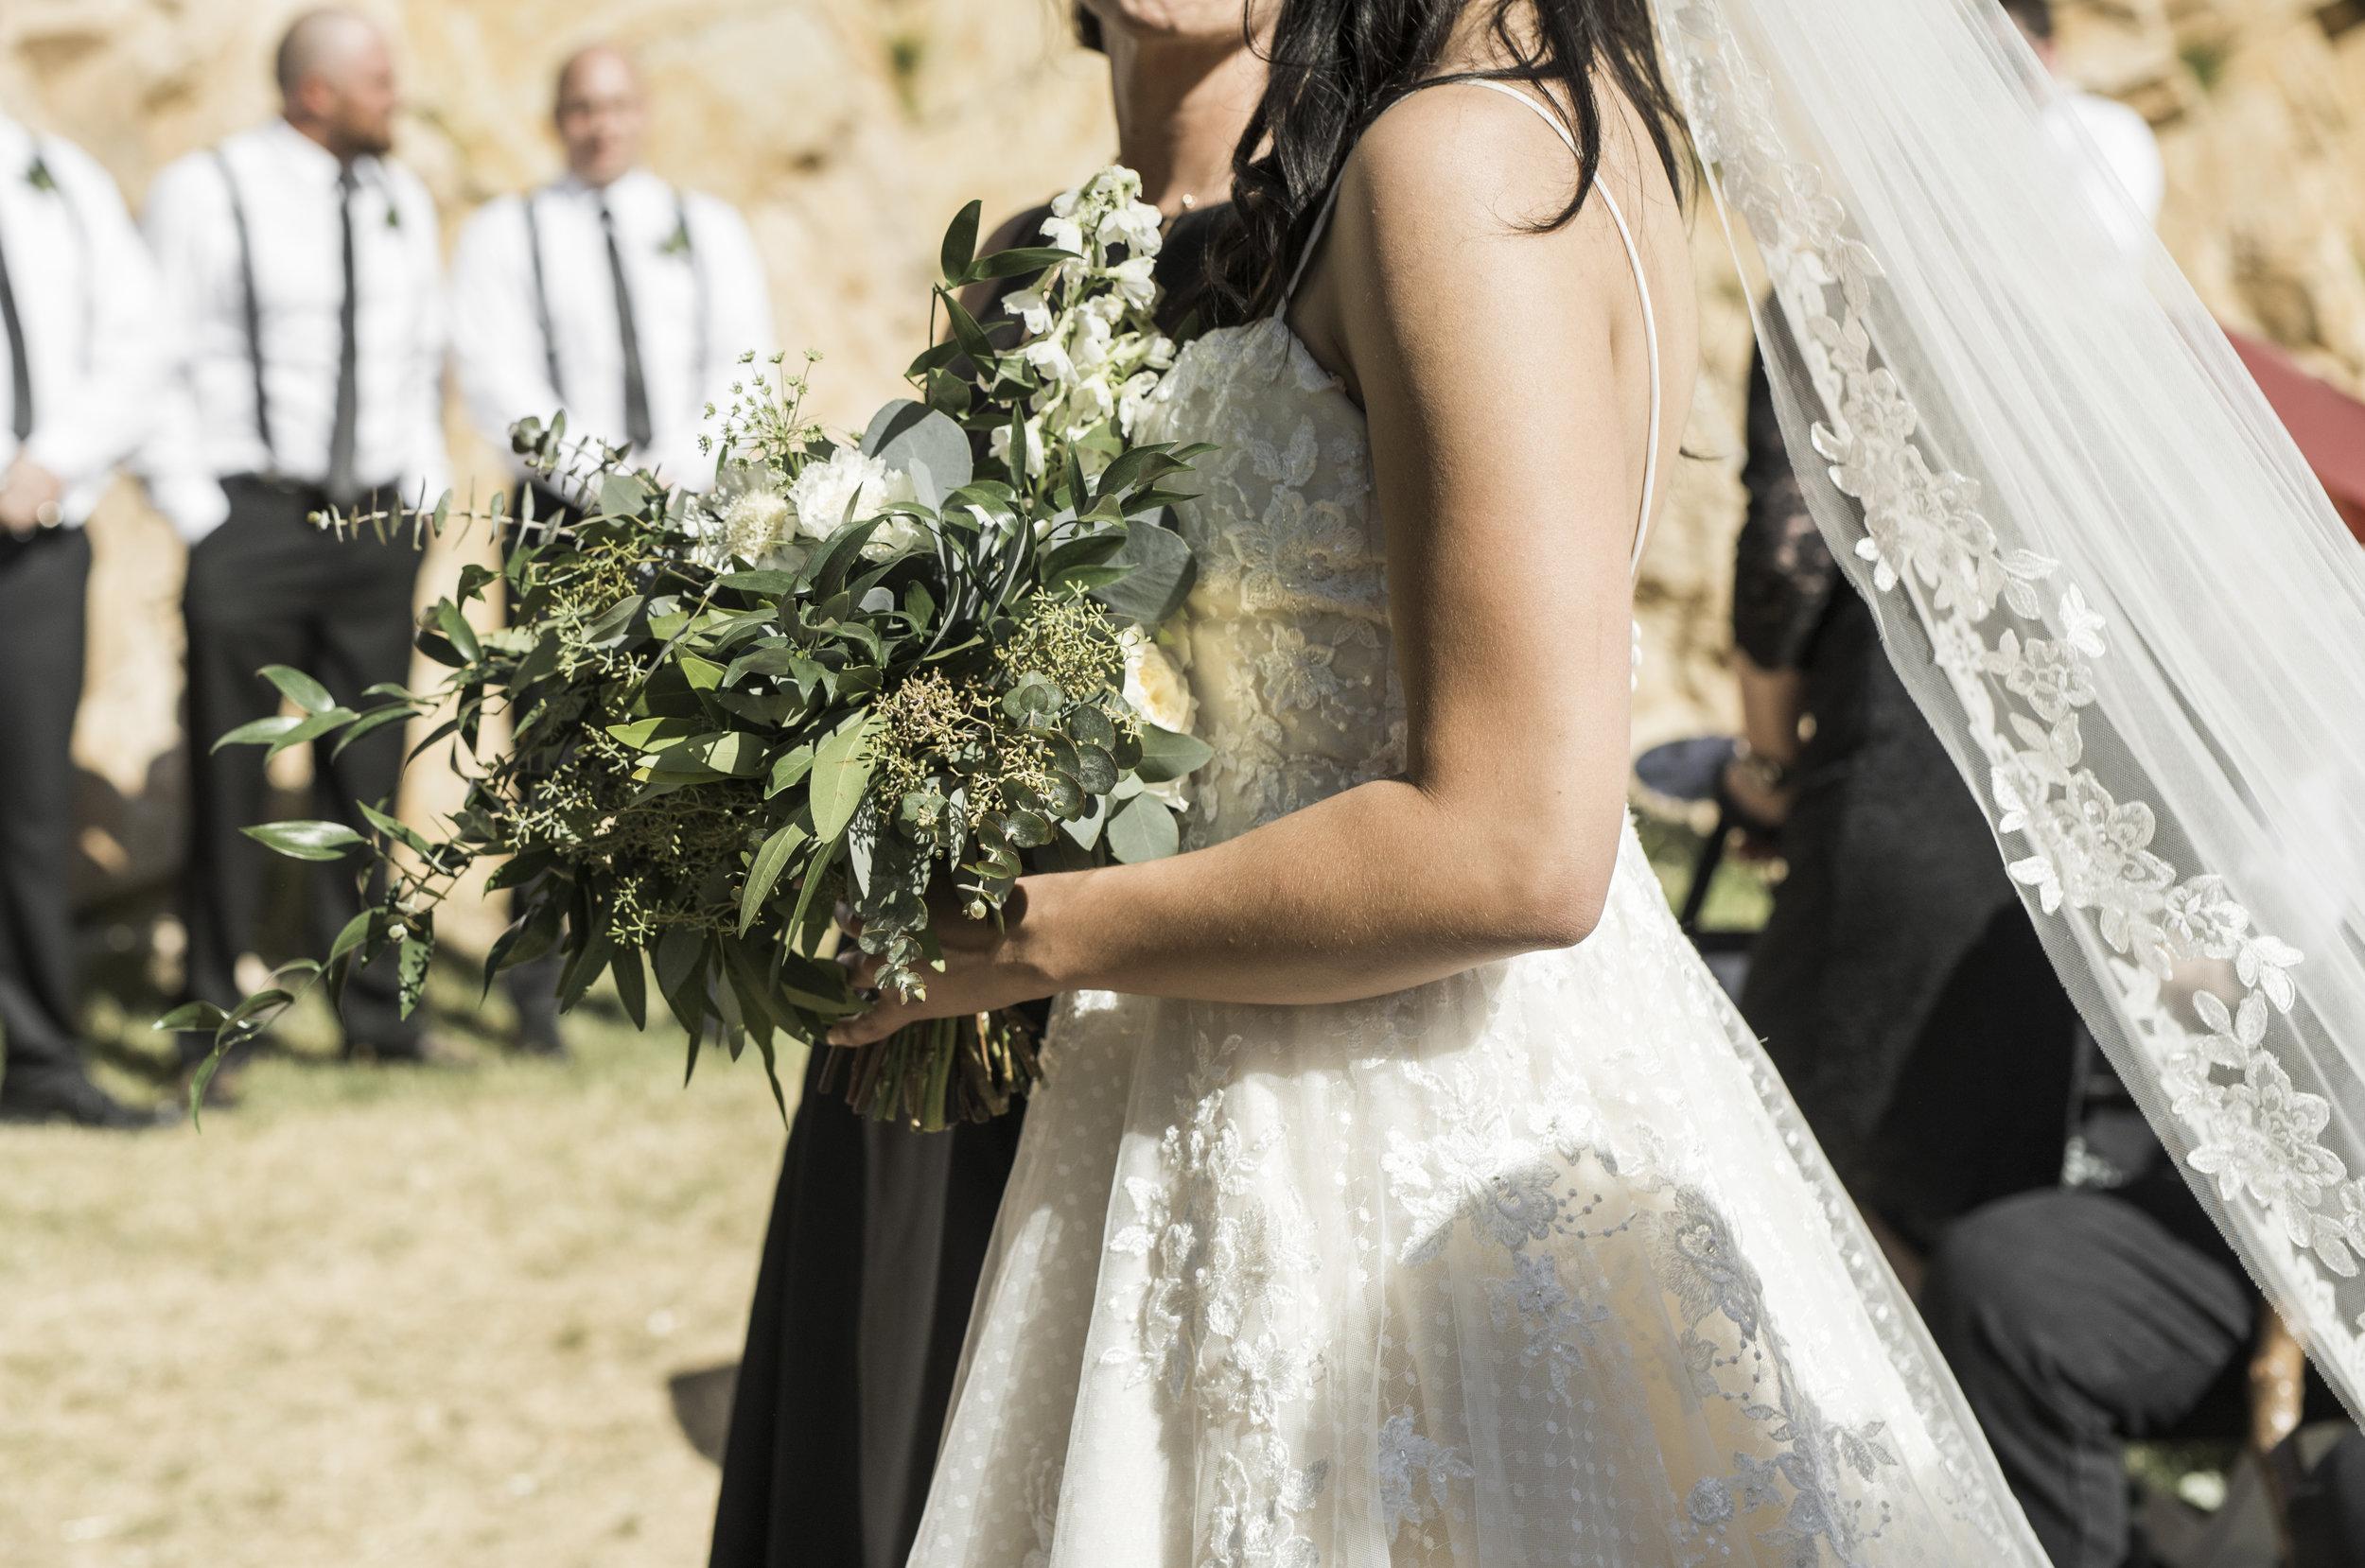 EBP_062517_WEDDING (404).jpg